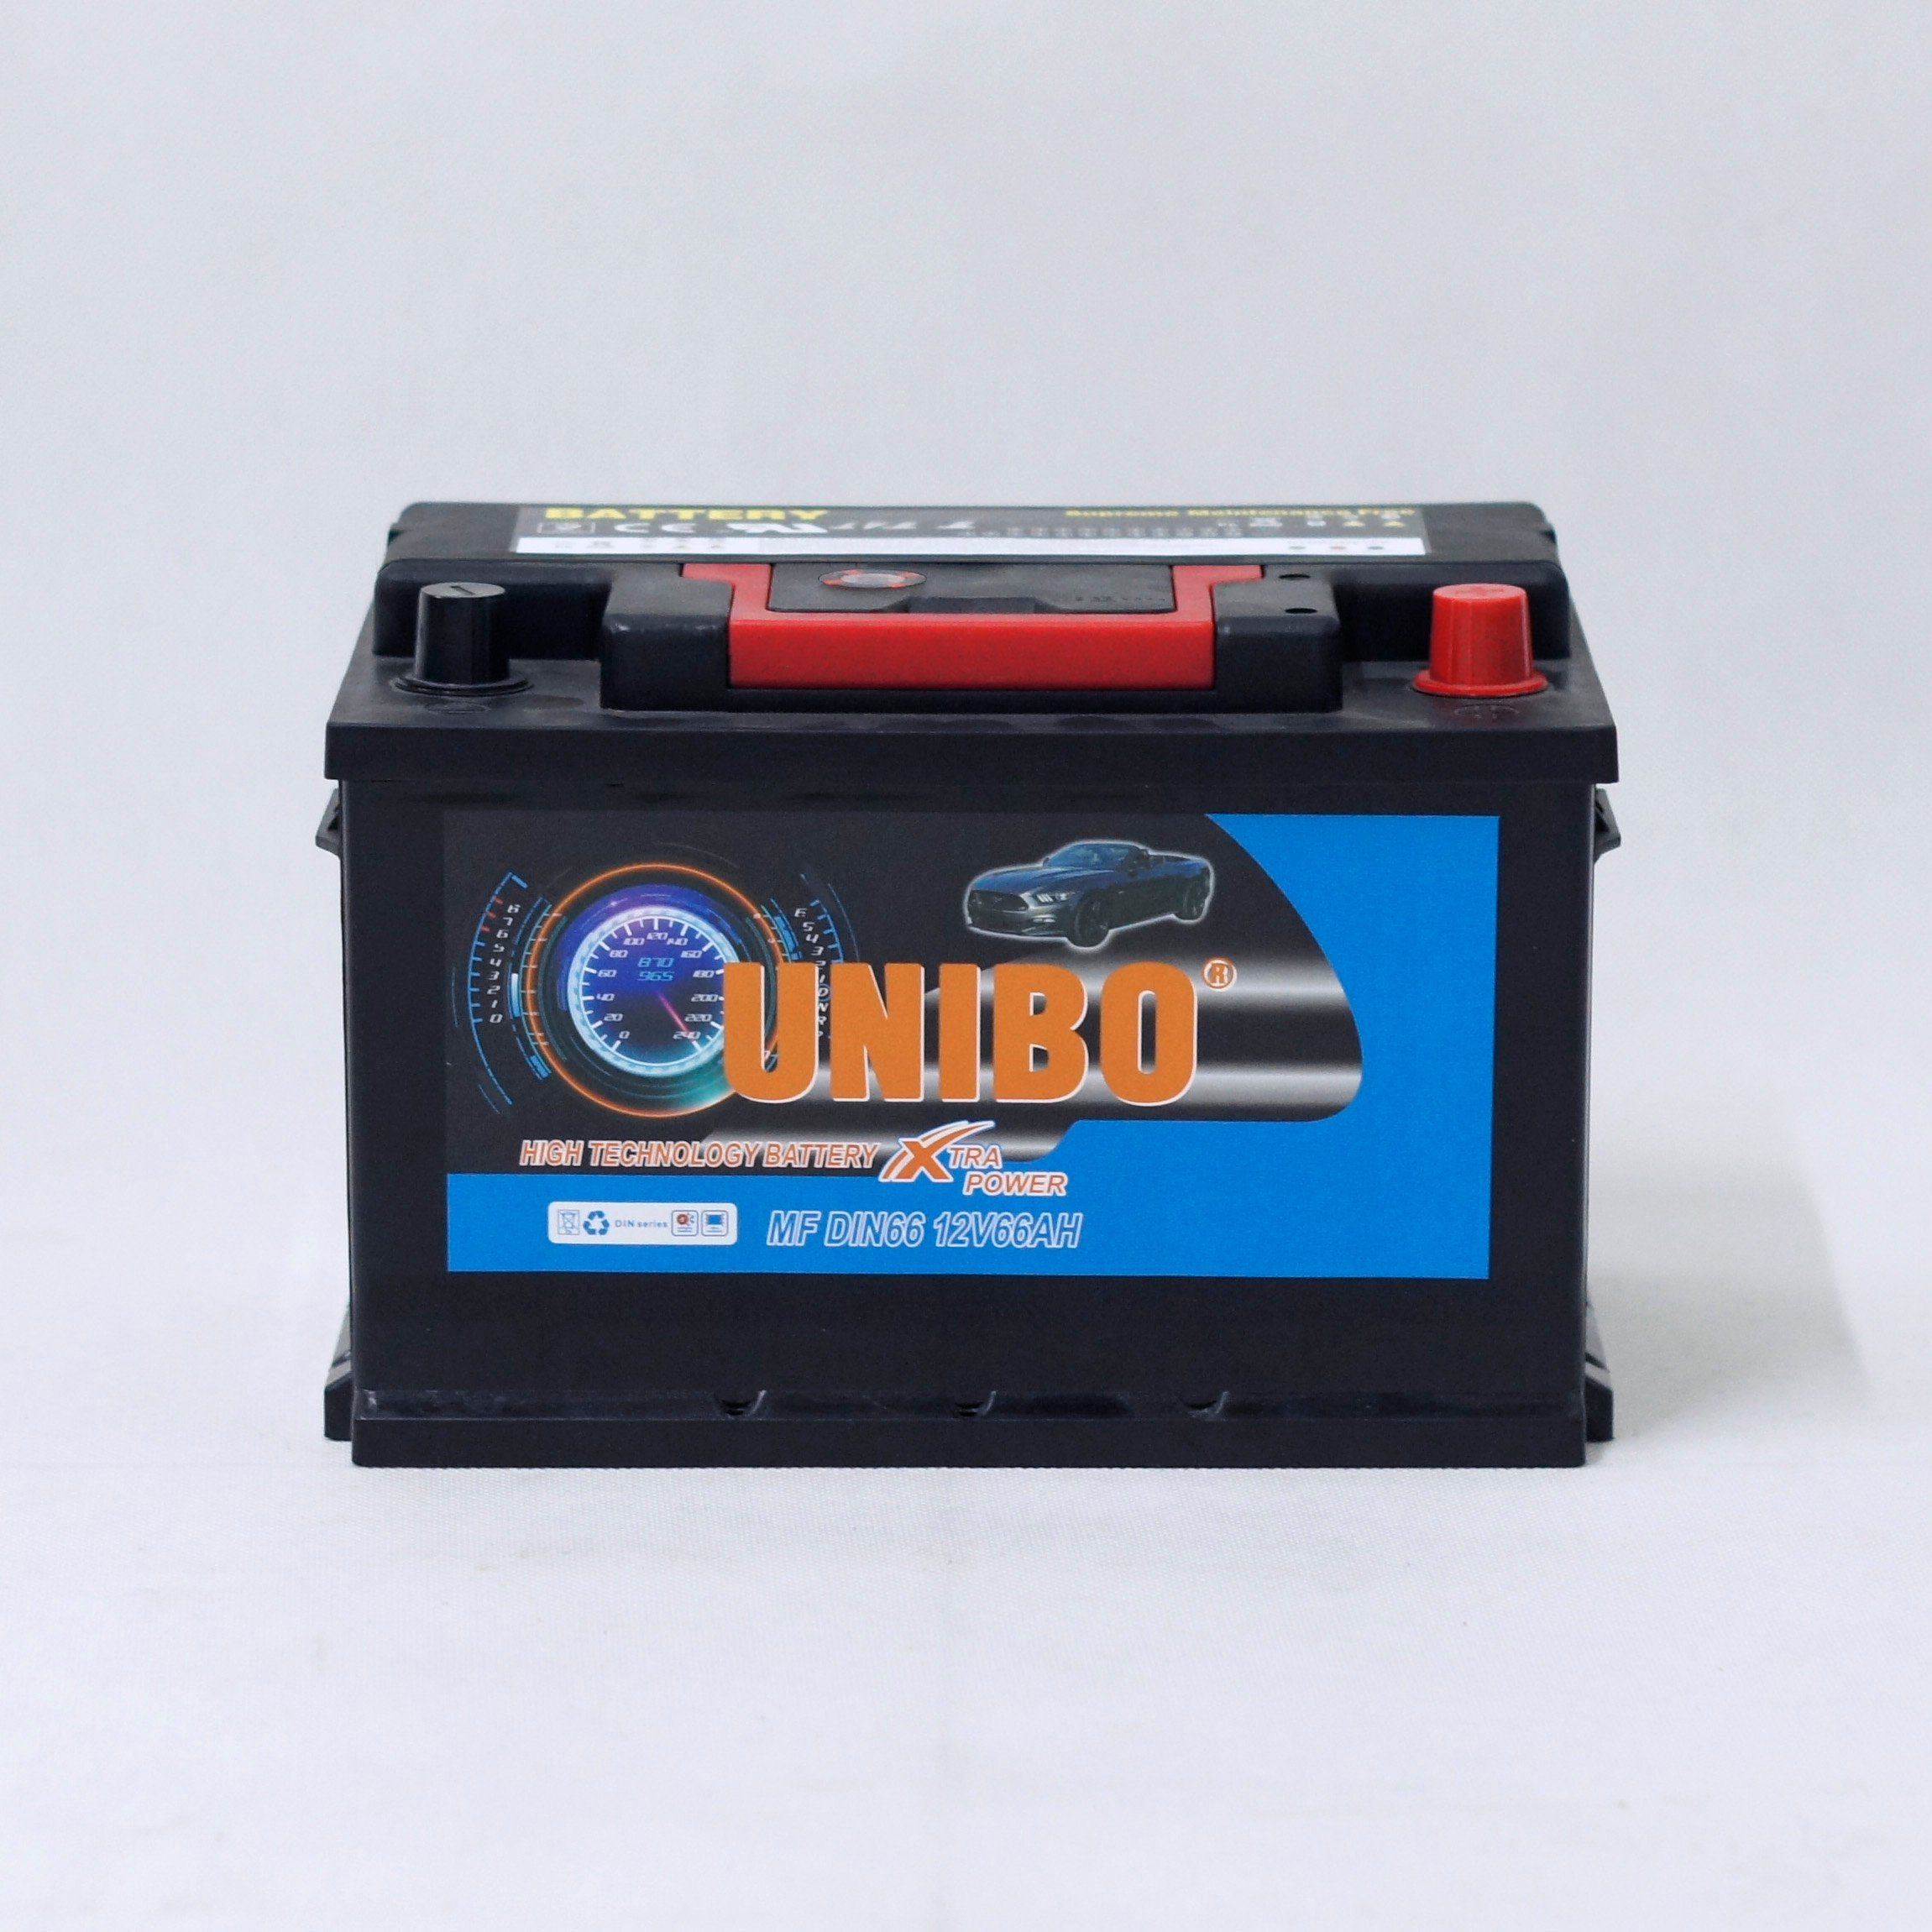 Maintenance Free Car Battery DIN66 12V66ah High Performance Auto Battery